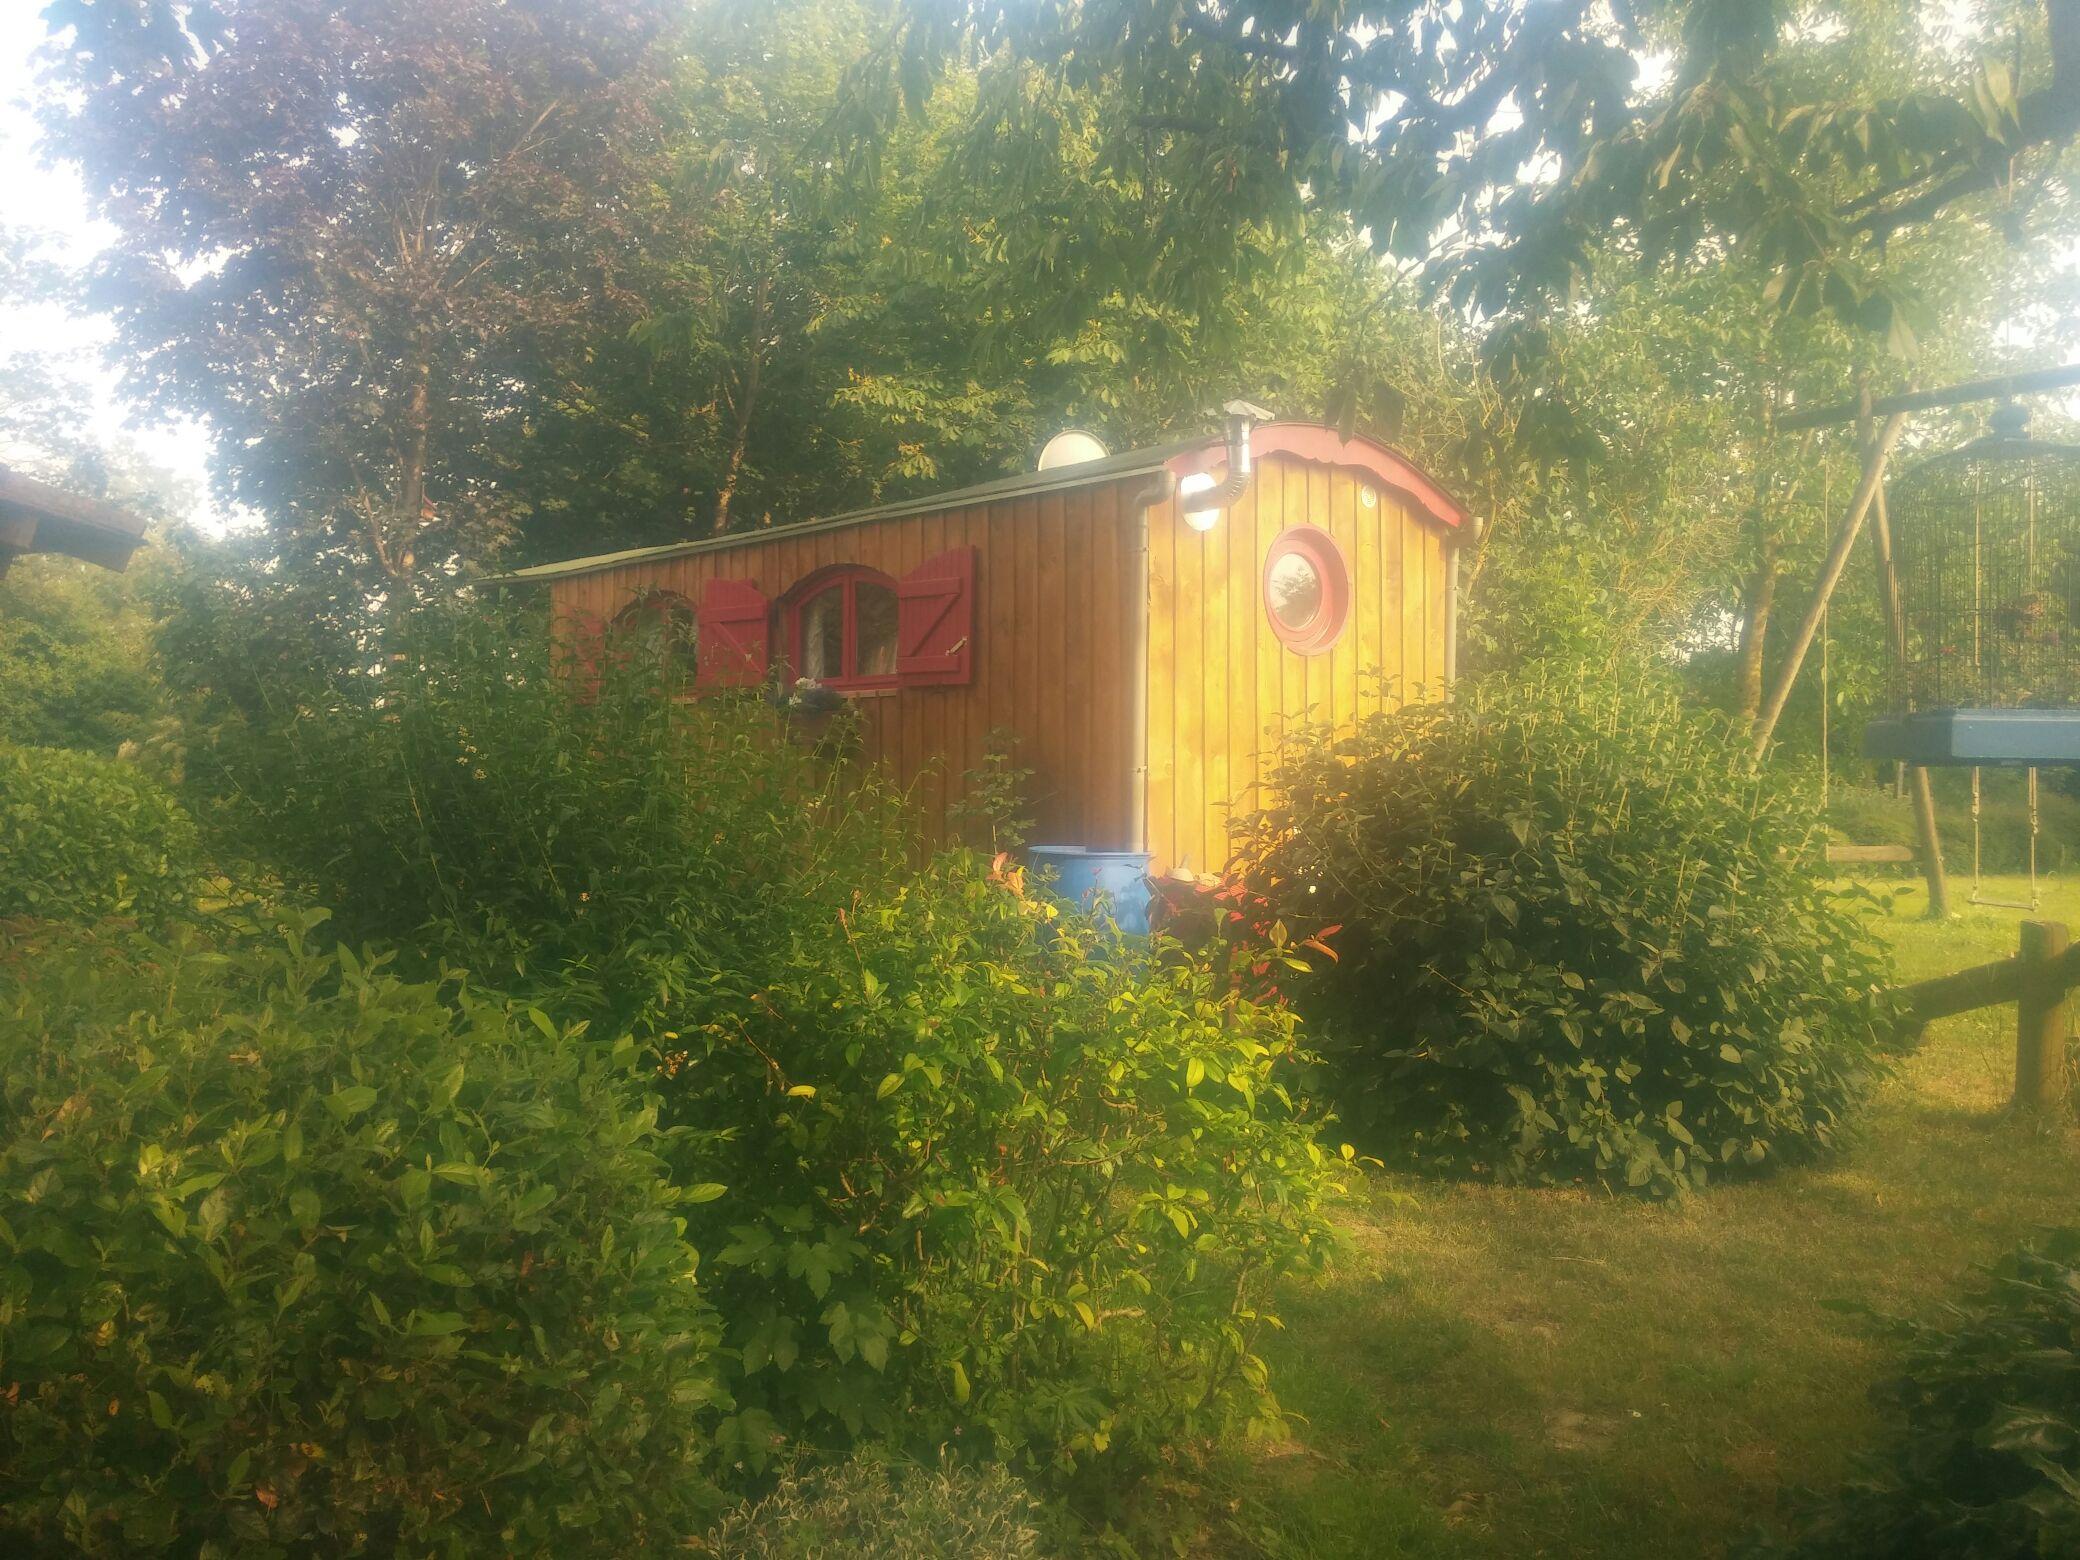 Architecte Paysagiste Midi Pyrénées roulotte - shepherd's huts (u.k., france) for rent in